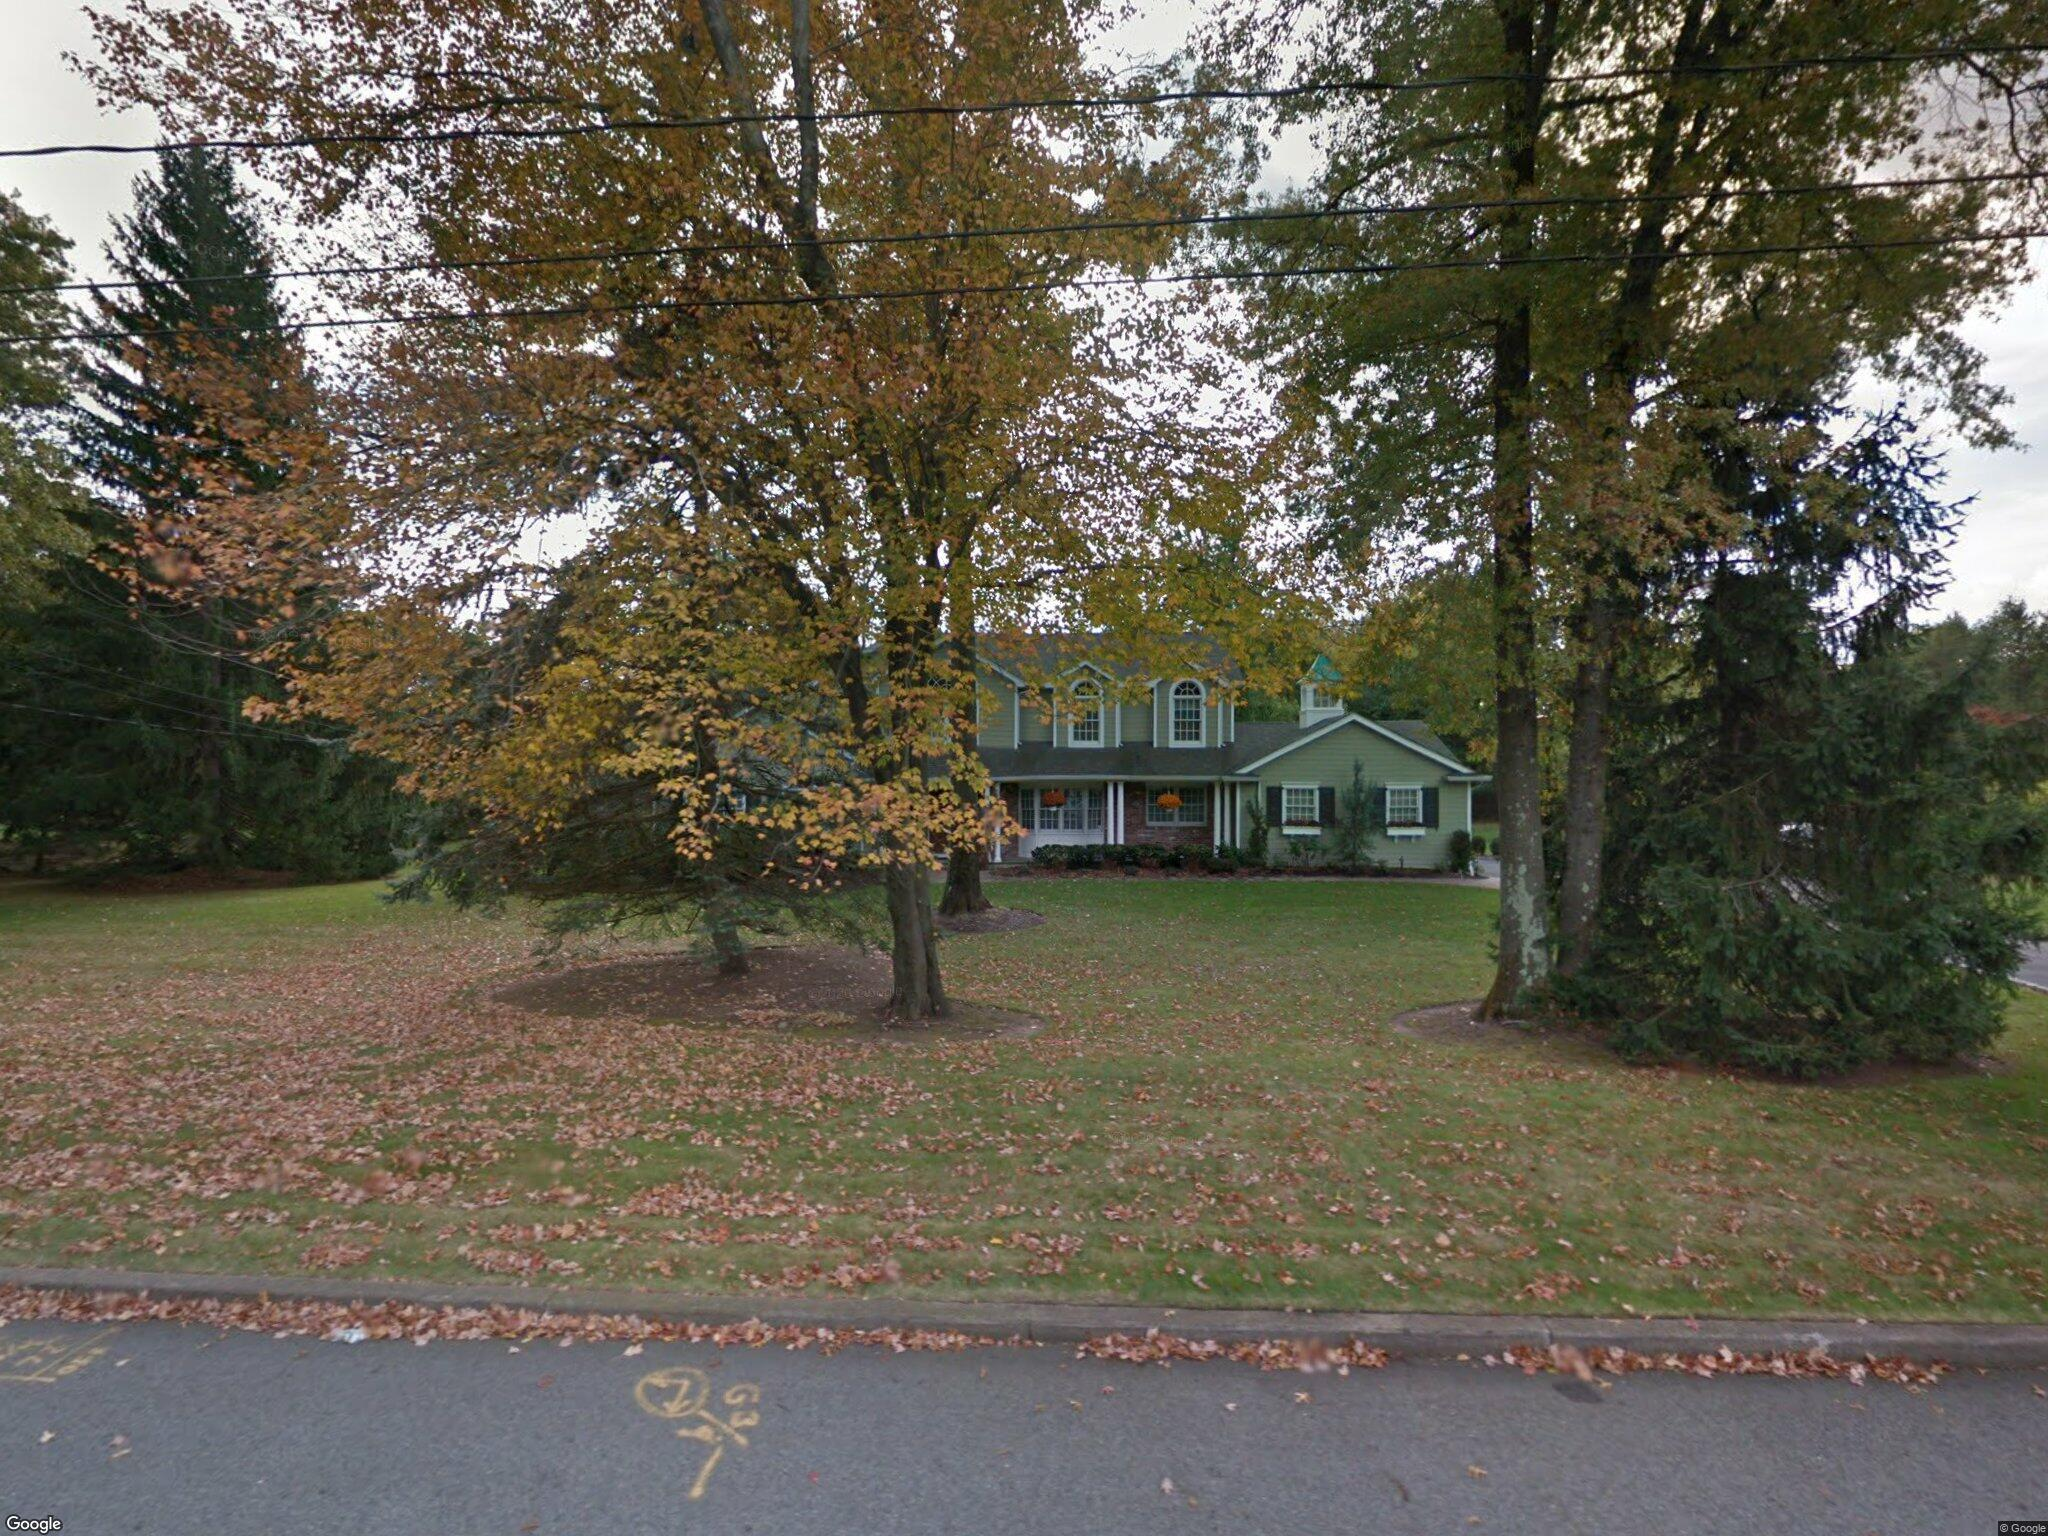 229 Bayberry Ln, Franklin Lakes, NJ 07417 | Trulia